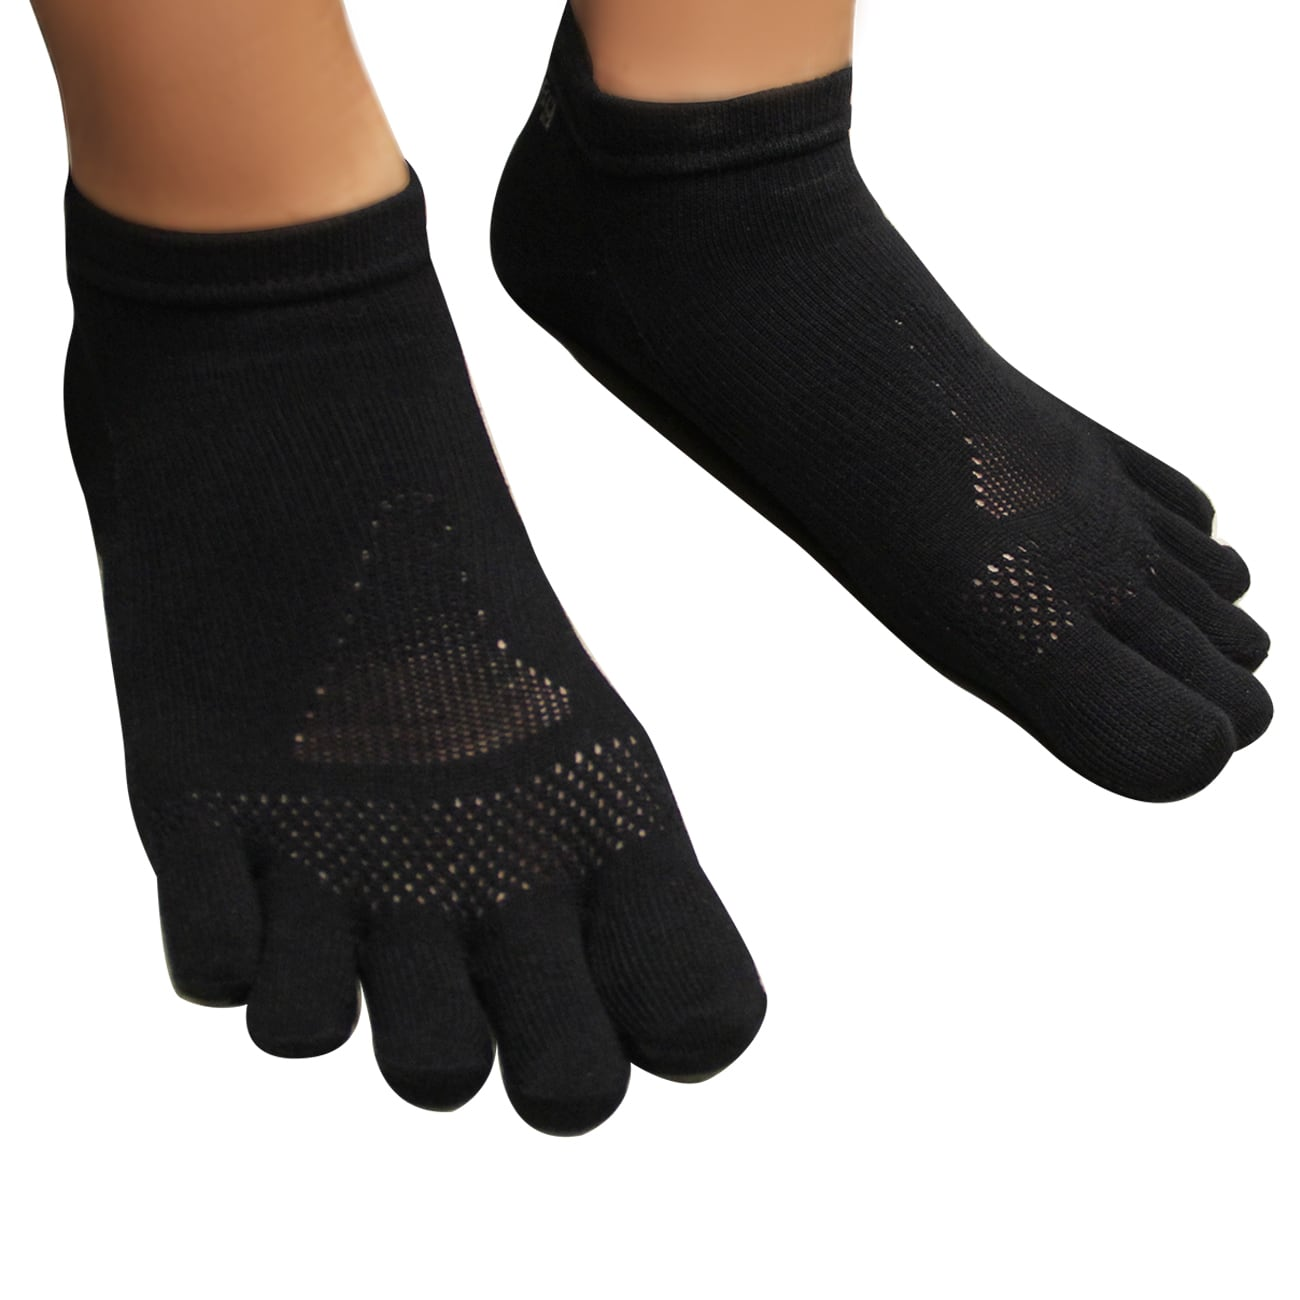 gleg socks  short length   ショート丈5本指ランニングソックス